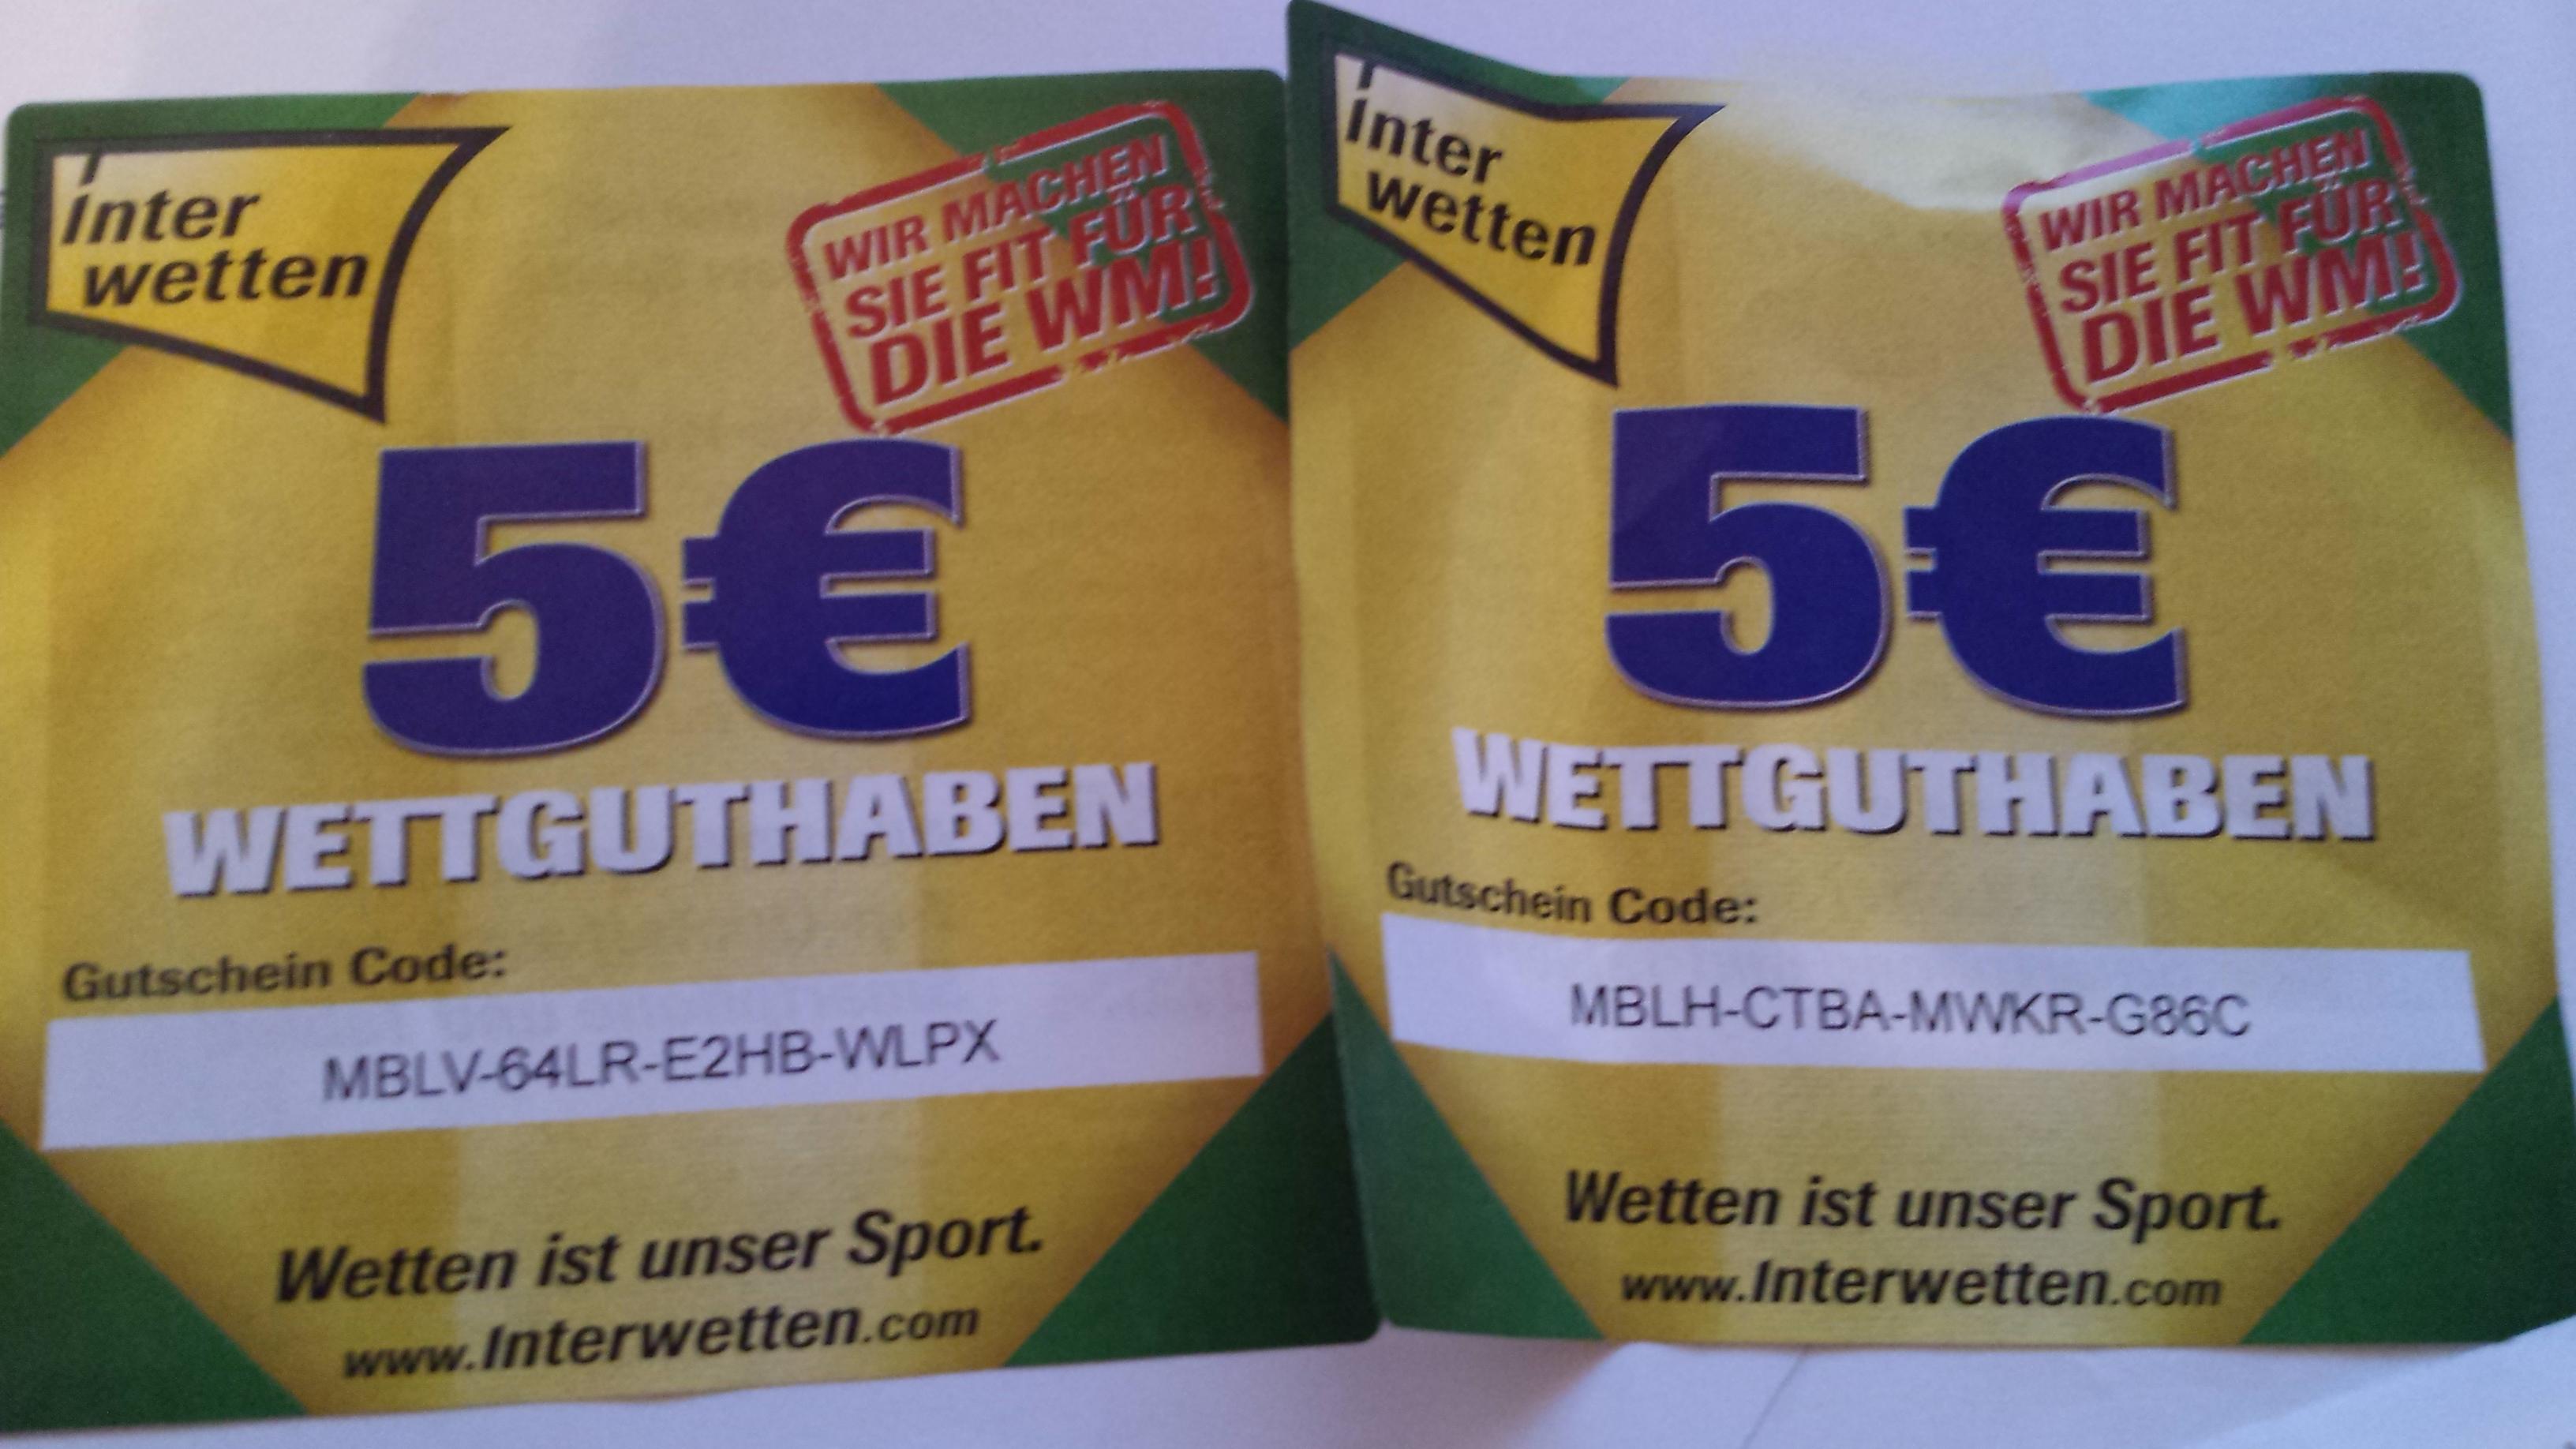 tipico 5 euro gutschein